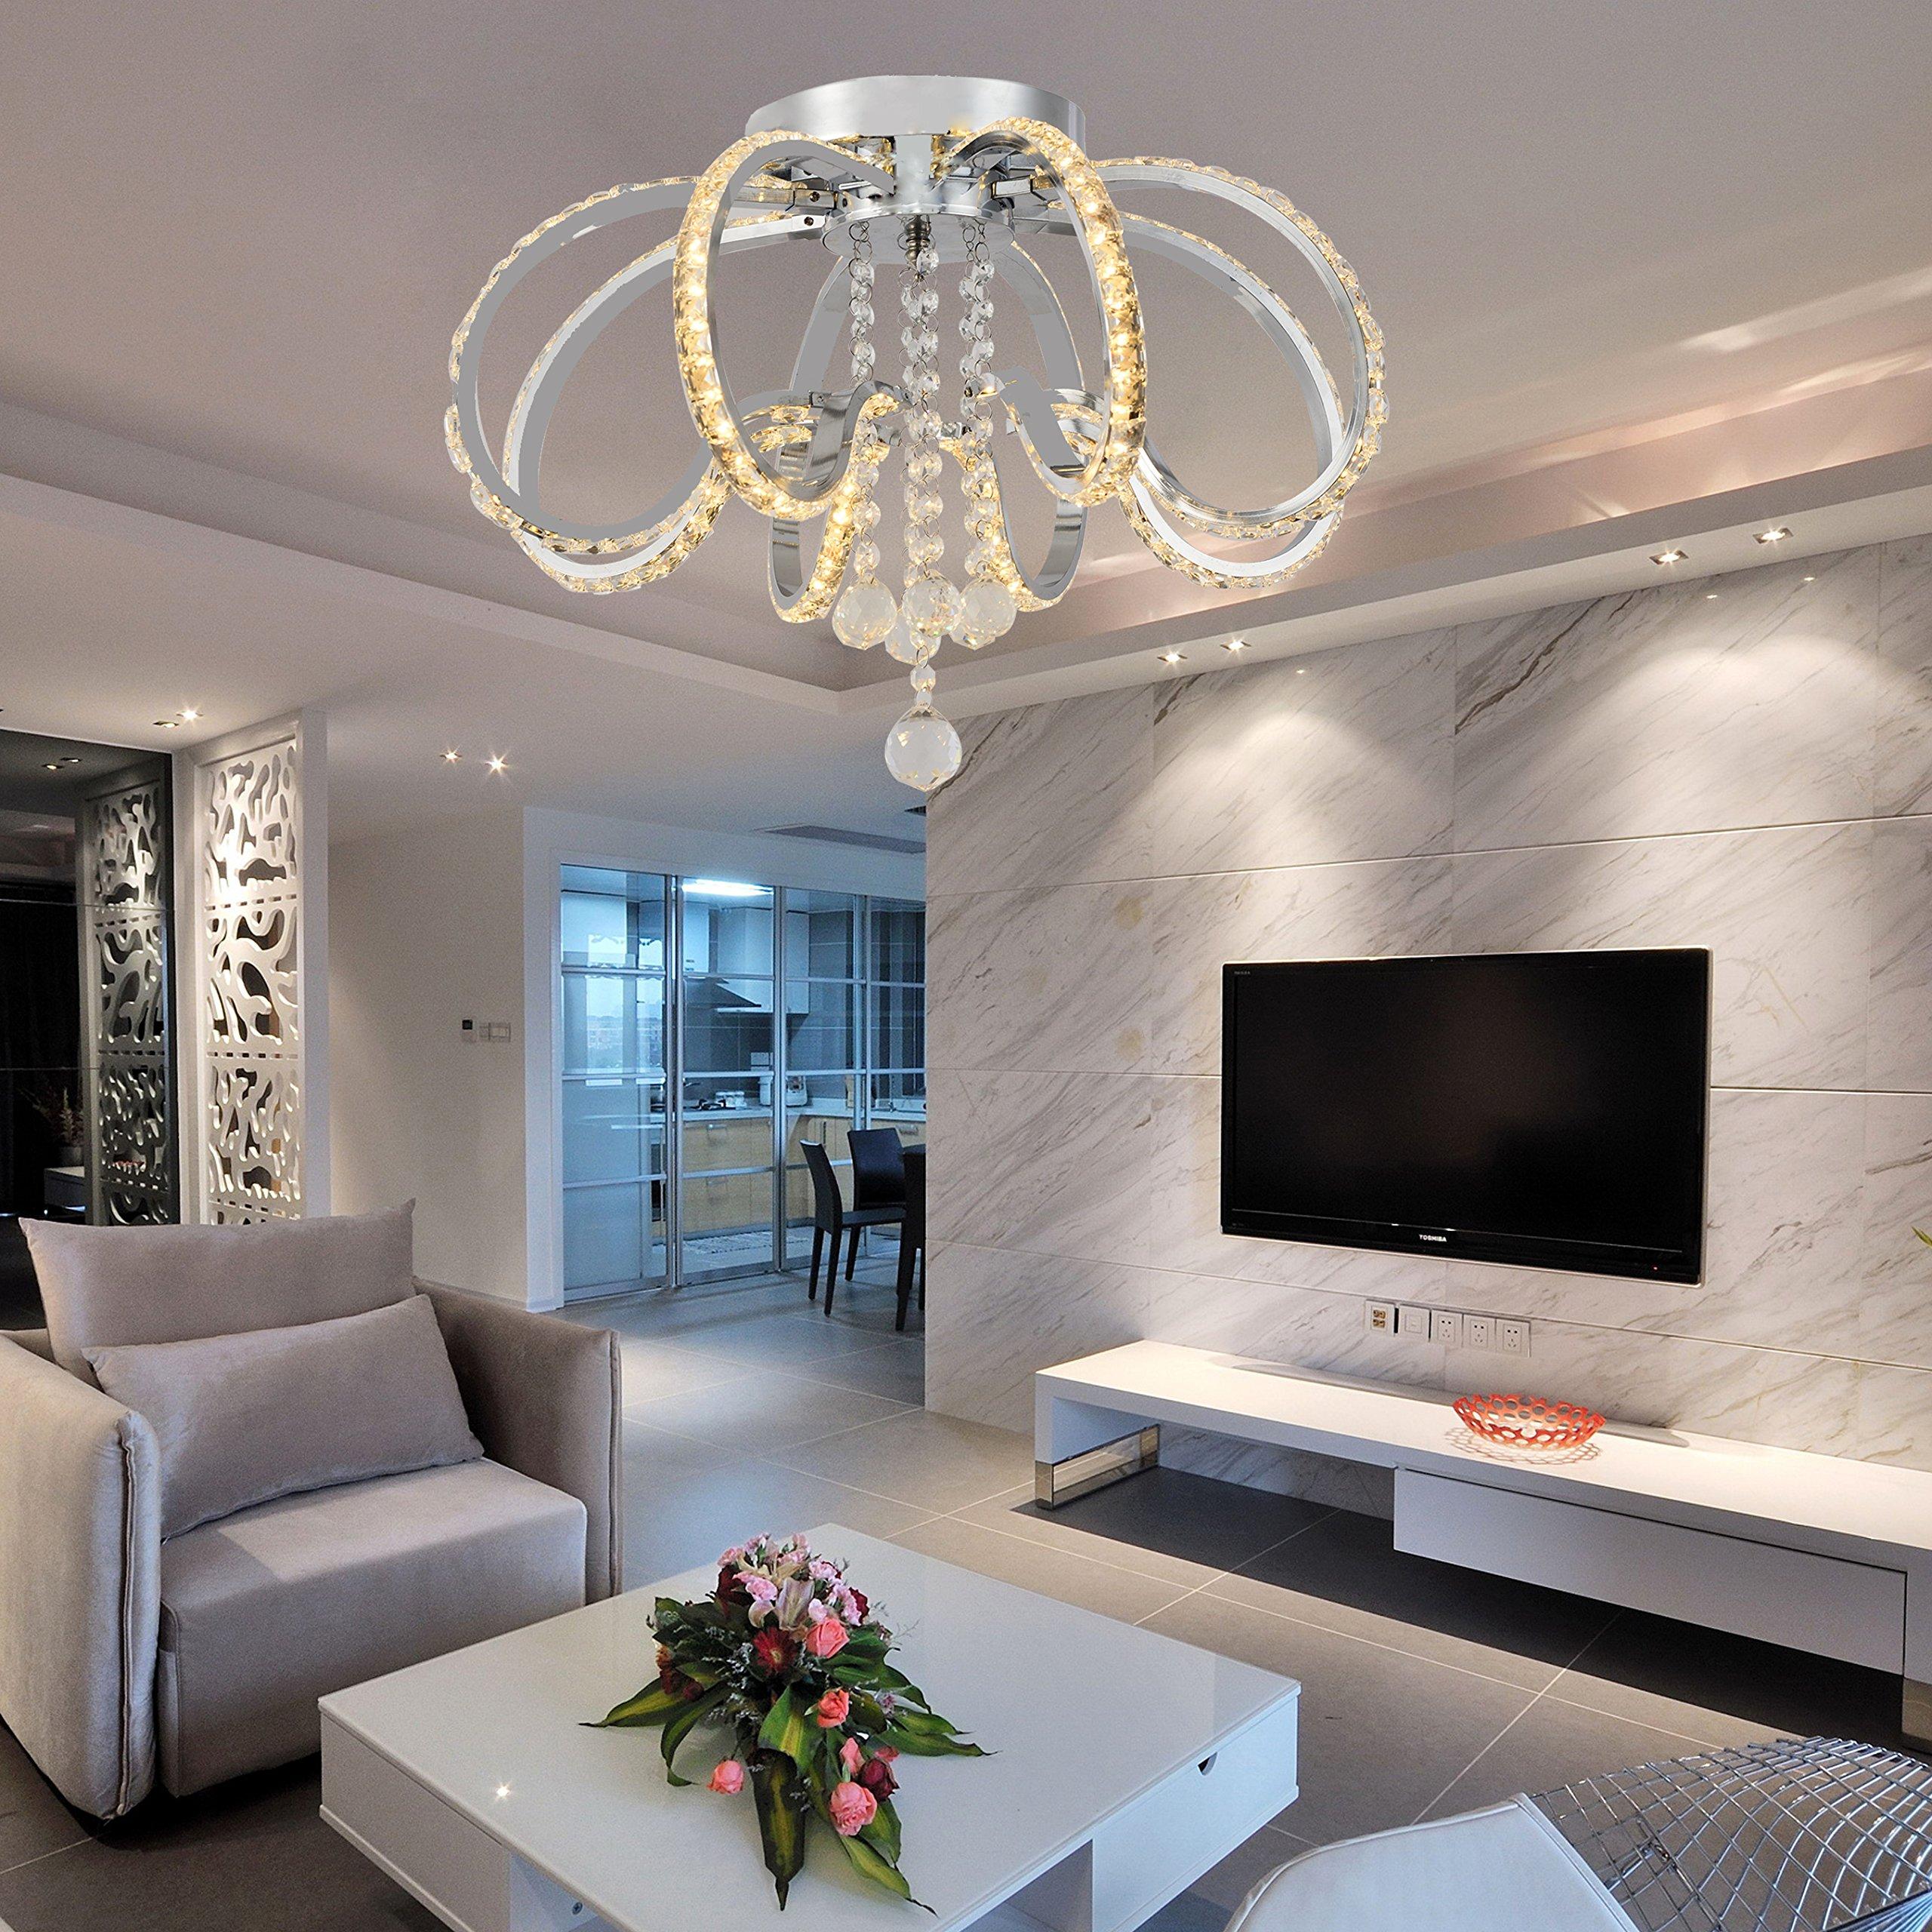 Flush Mount Ceiling Light Ceiling Lamp Pendant Light Chandelier LED Dimmable Contemporary Metal Crystal Ceiling Lamp Pendant Light for Living Room,Bedroom ,Dining Room ,Children's Room Bulb Included